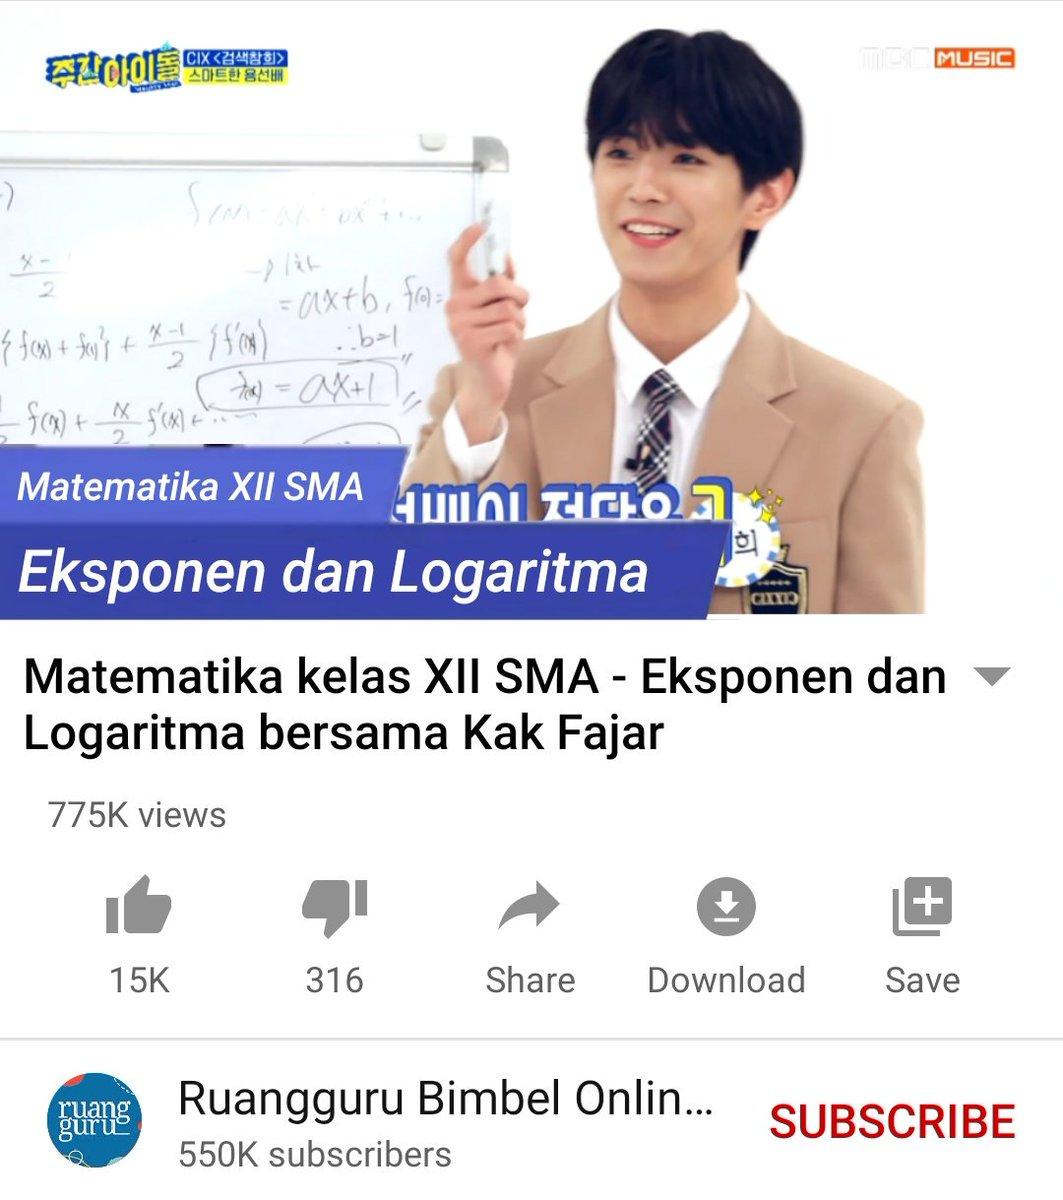 Fixeu Or Fixh On Twitter C9b Yonghee Sebagai Brand Ambassador Ruangguru Https T Co 1gunukja0n